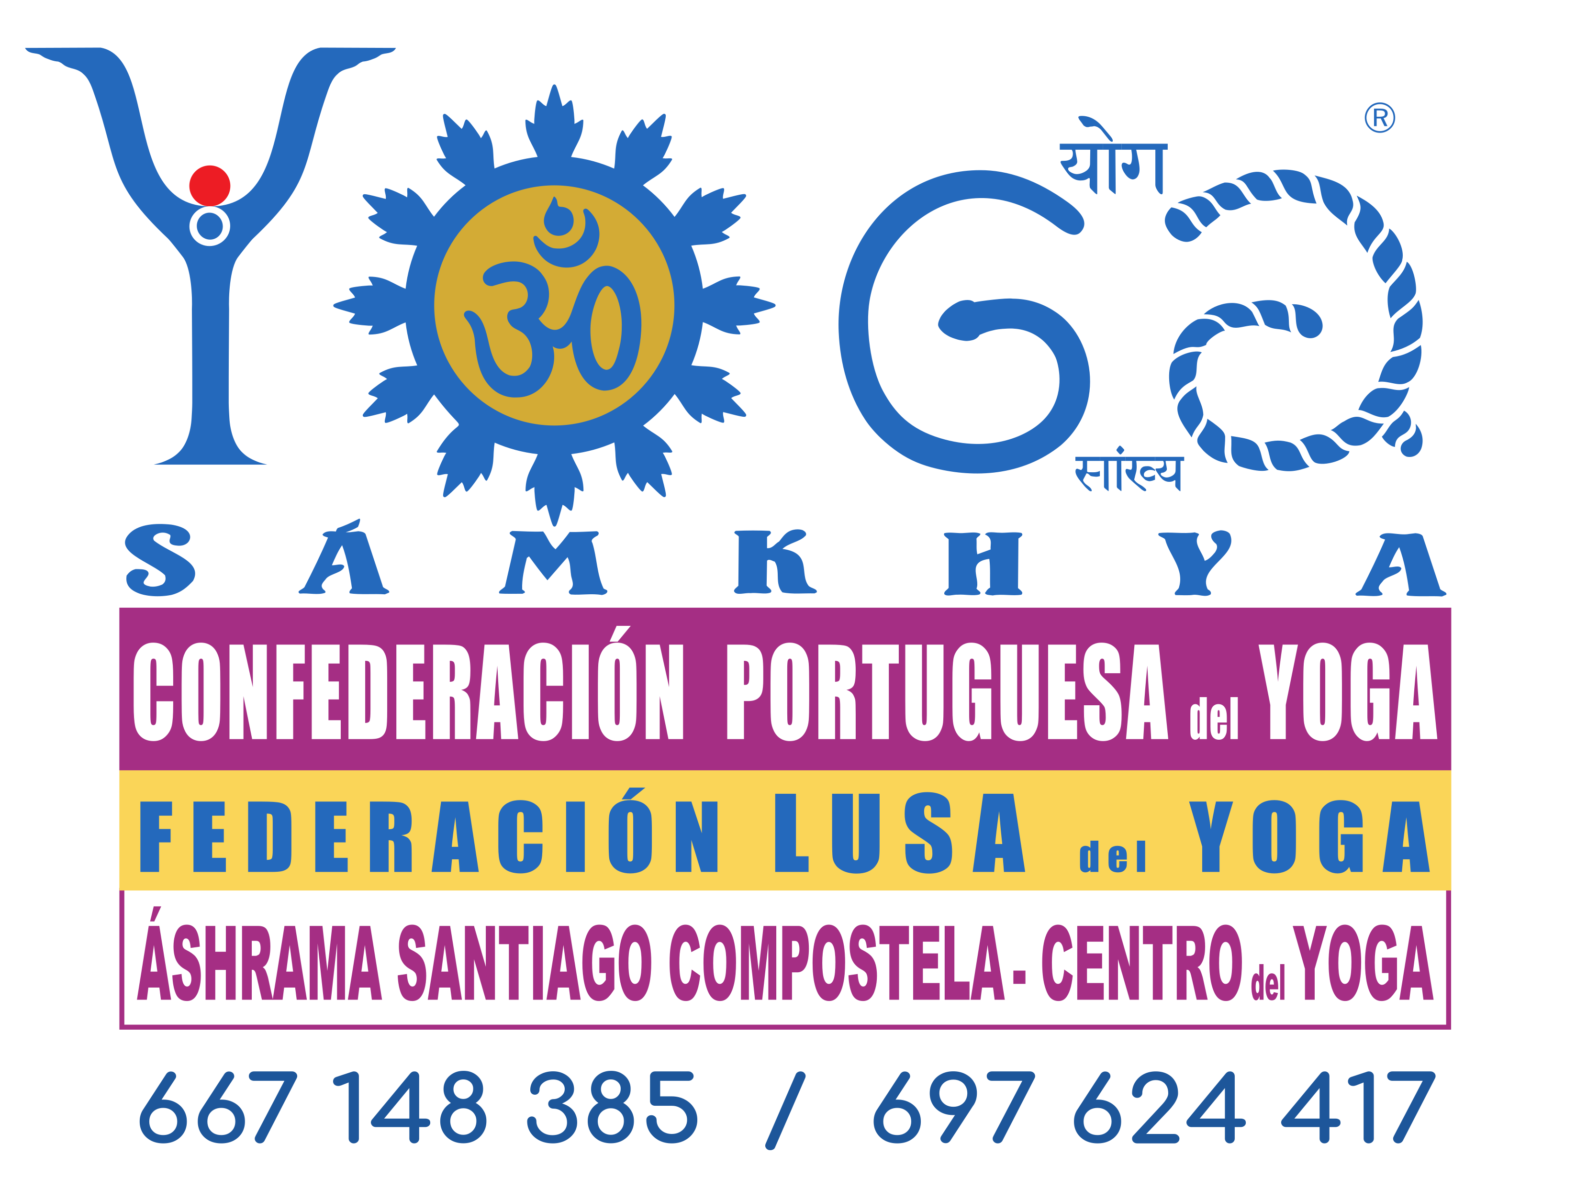 Áshrama Santiago Compostela - Centro de Yoga - logo